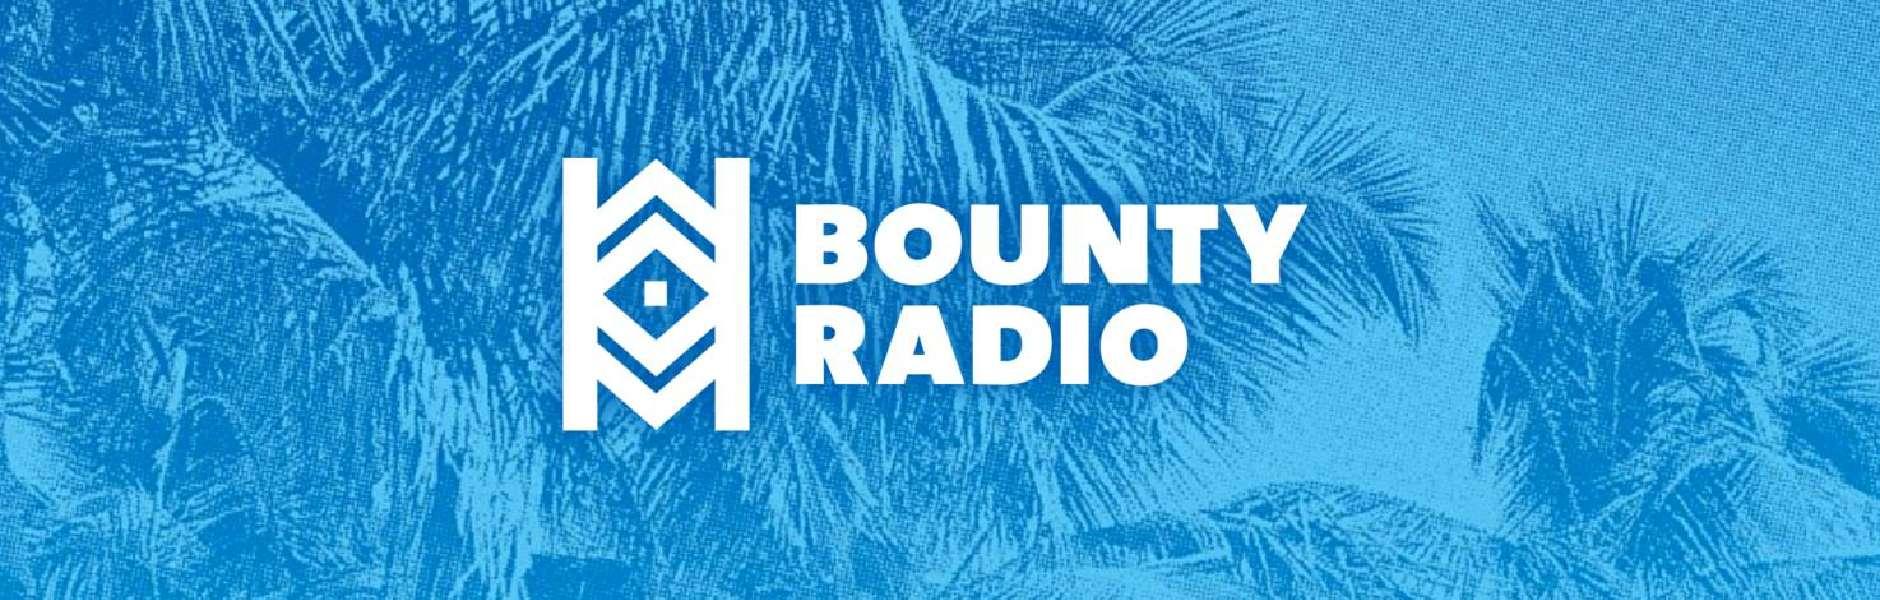 Bounty Radio